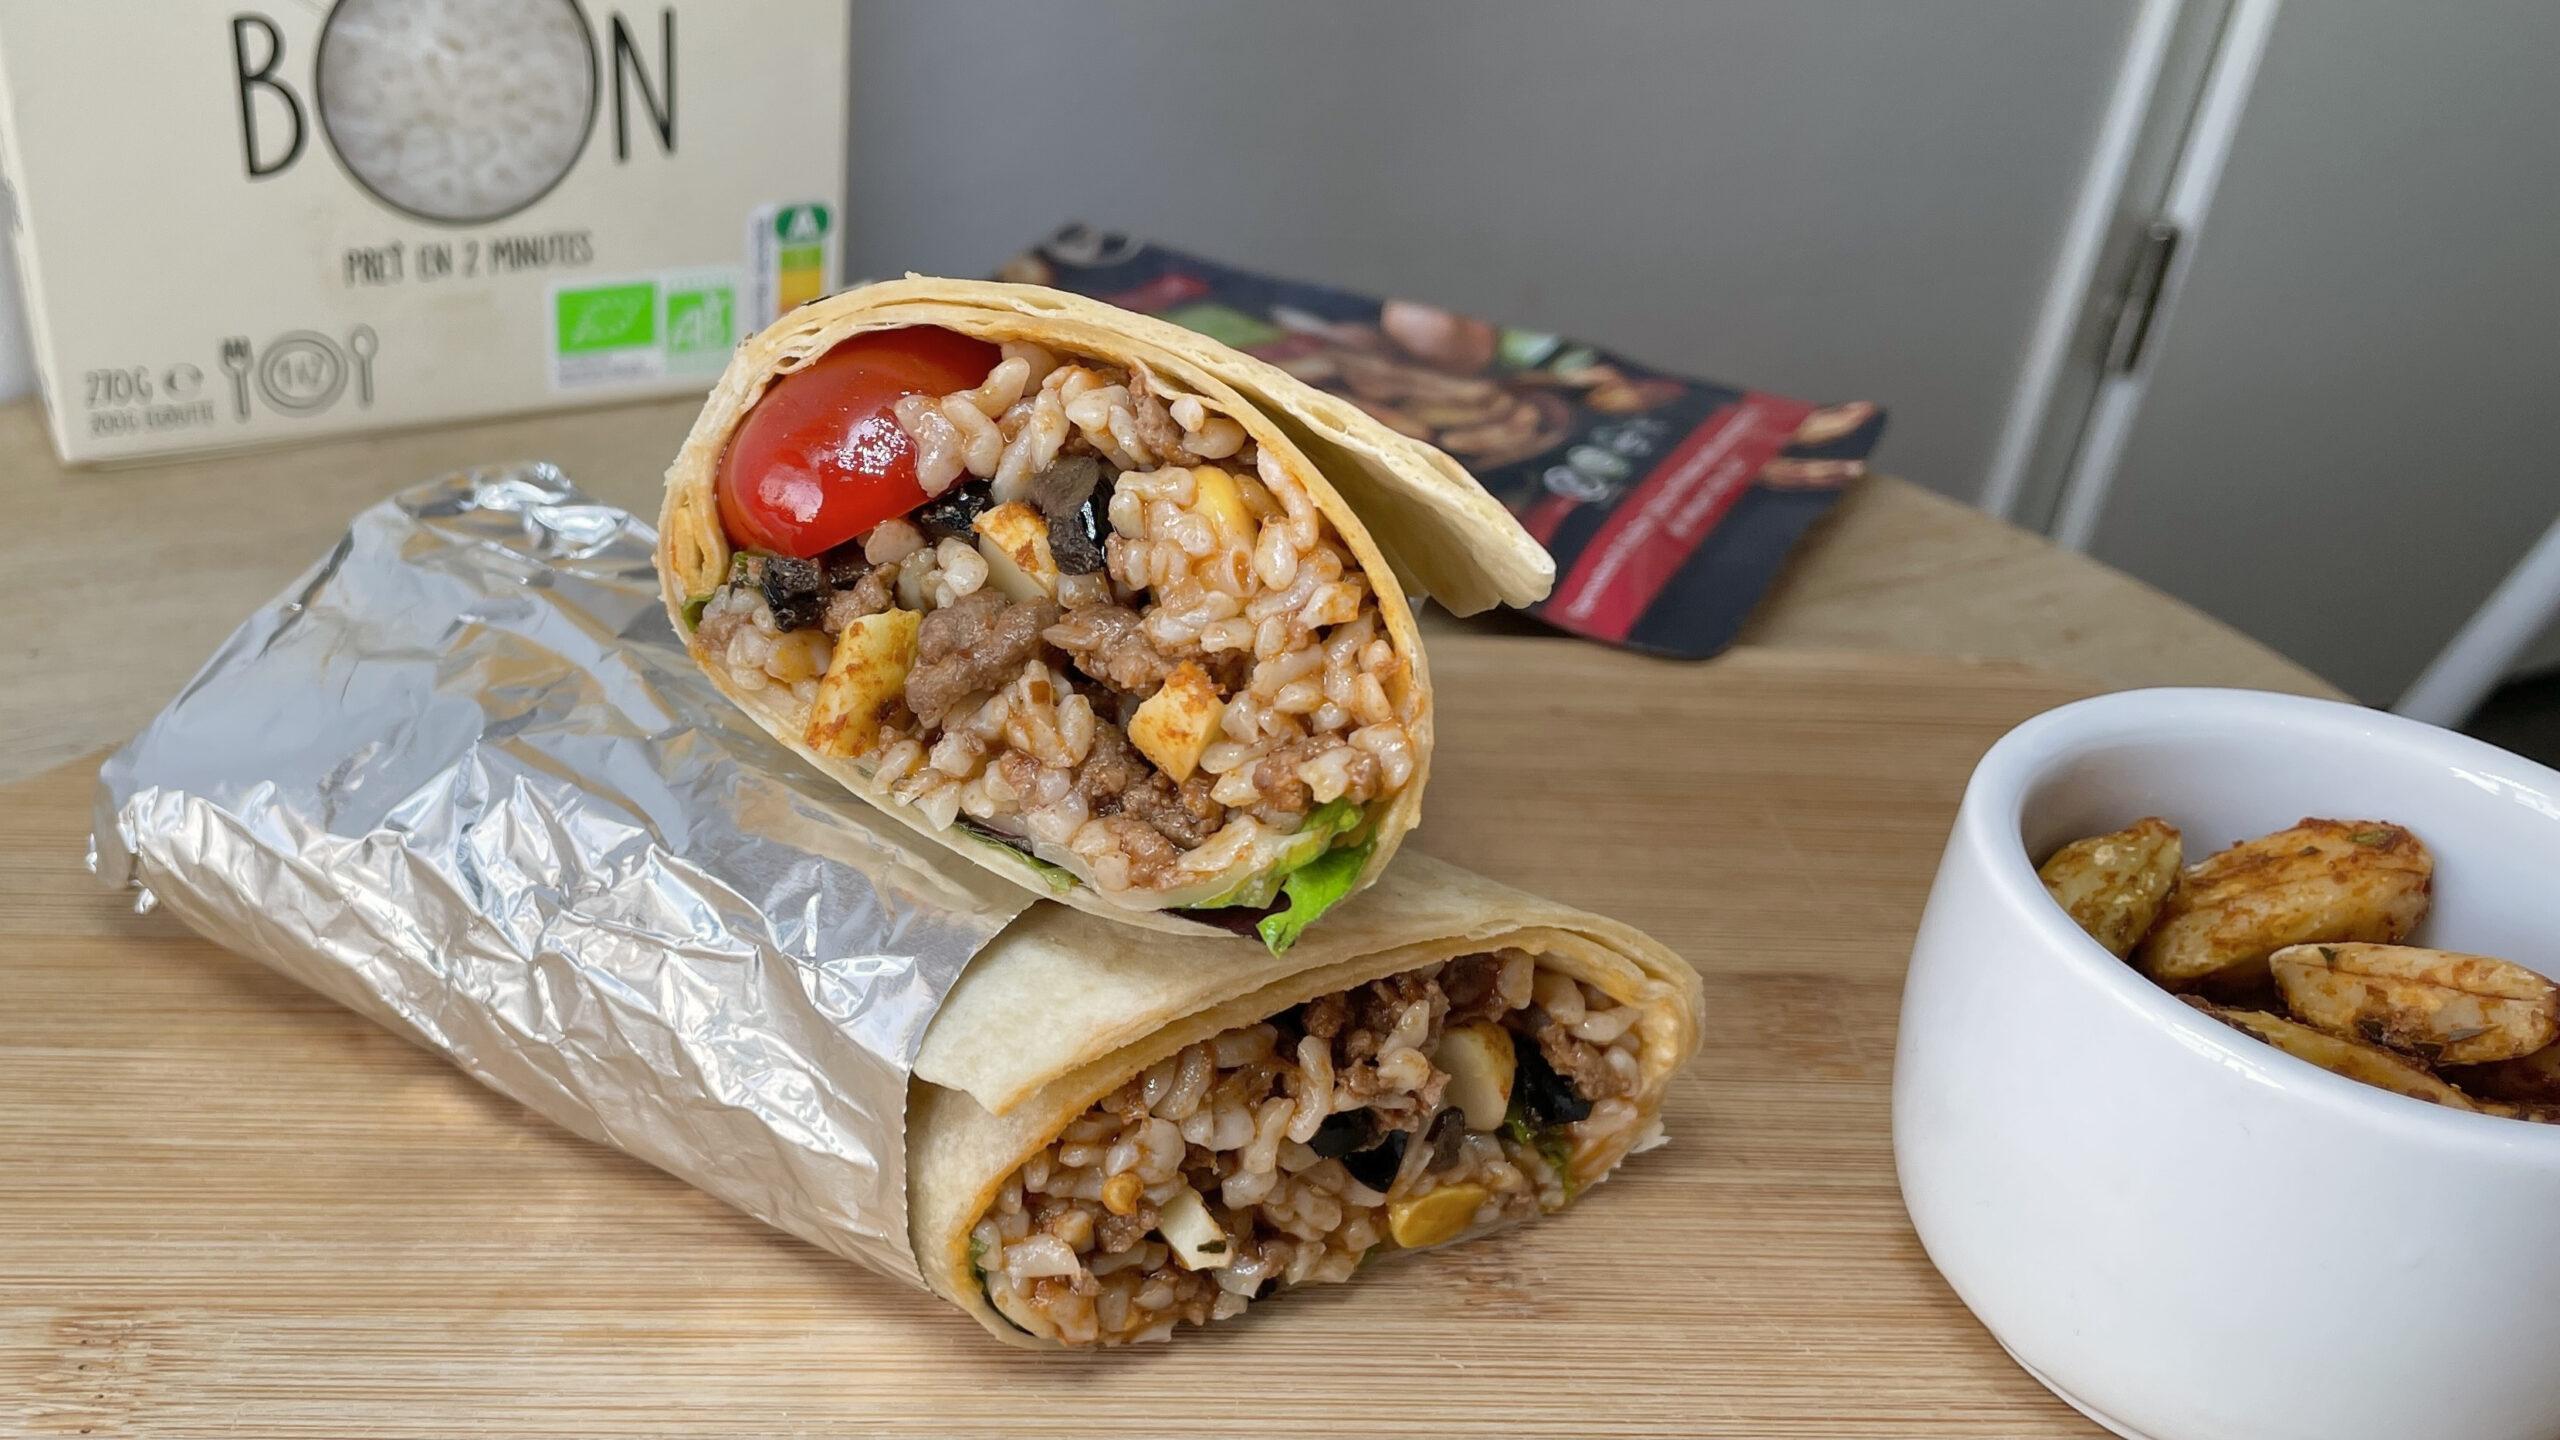 Burrito keto